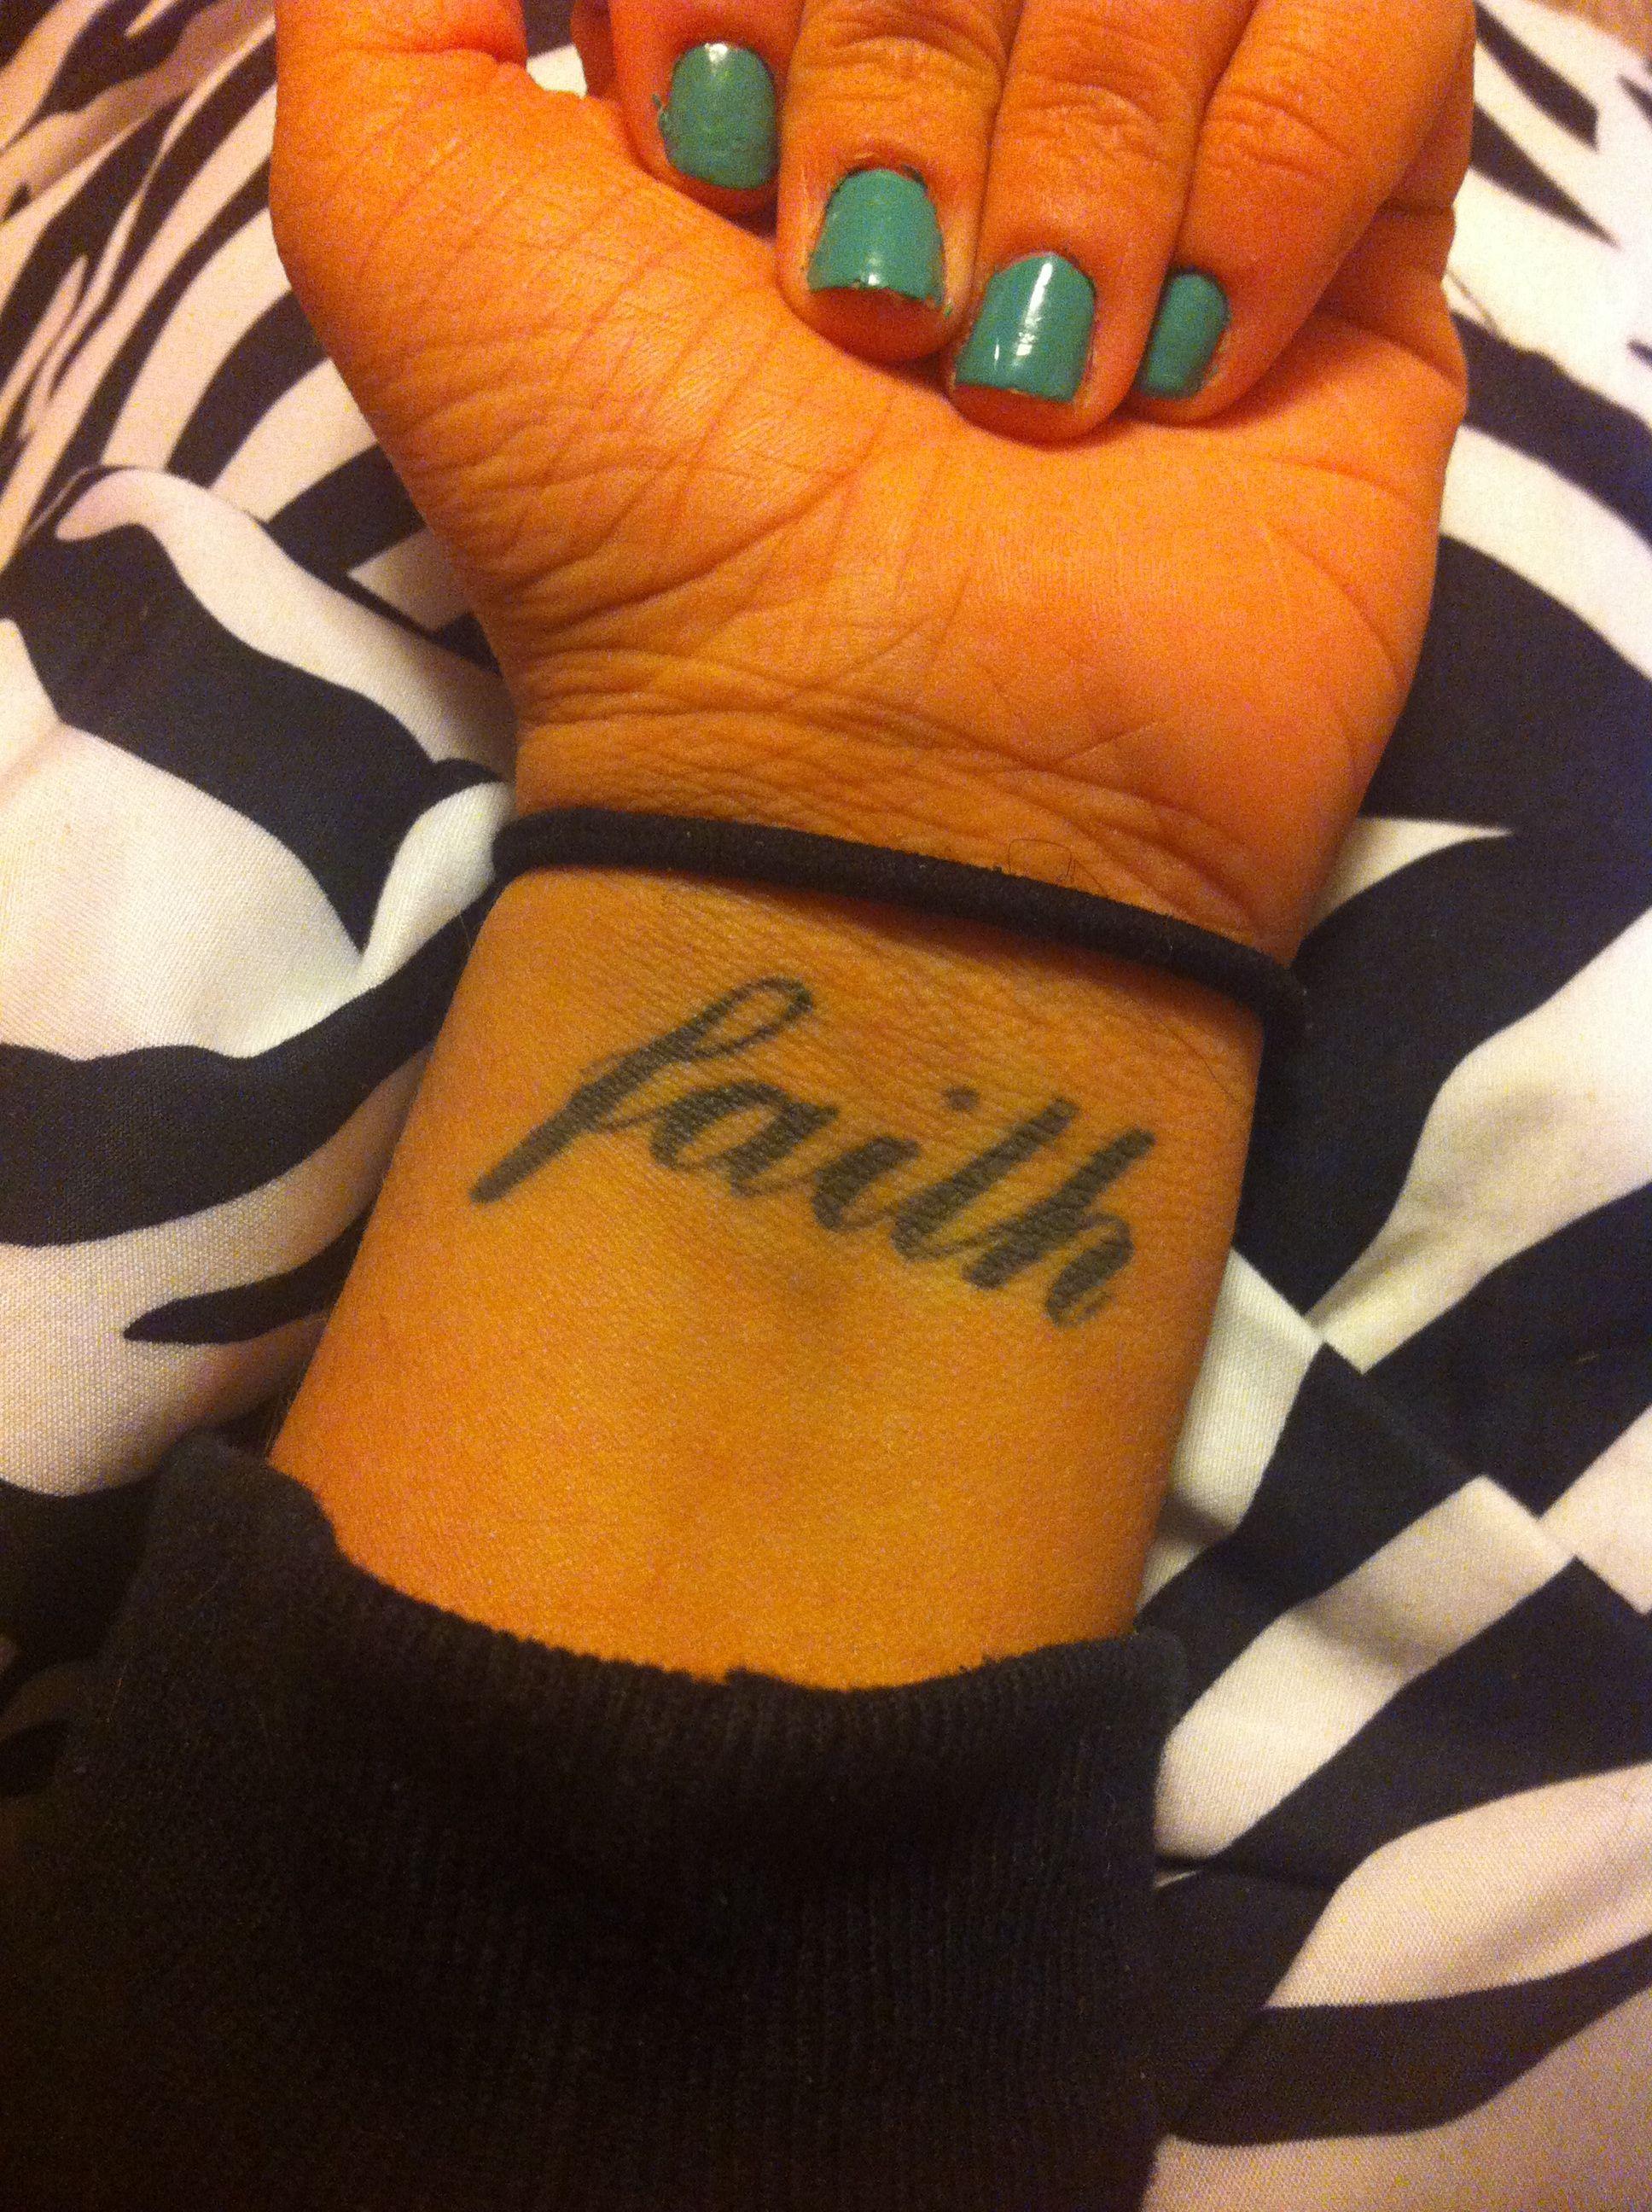 6 Sheets Wrist Body Art Henna Tattoo Stencil Flower: Faith Wrist Tattoo